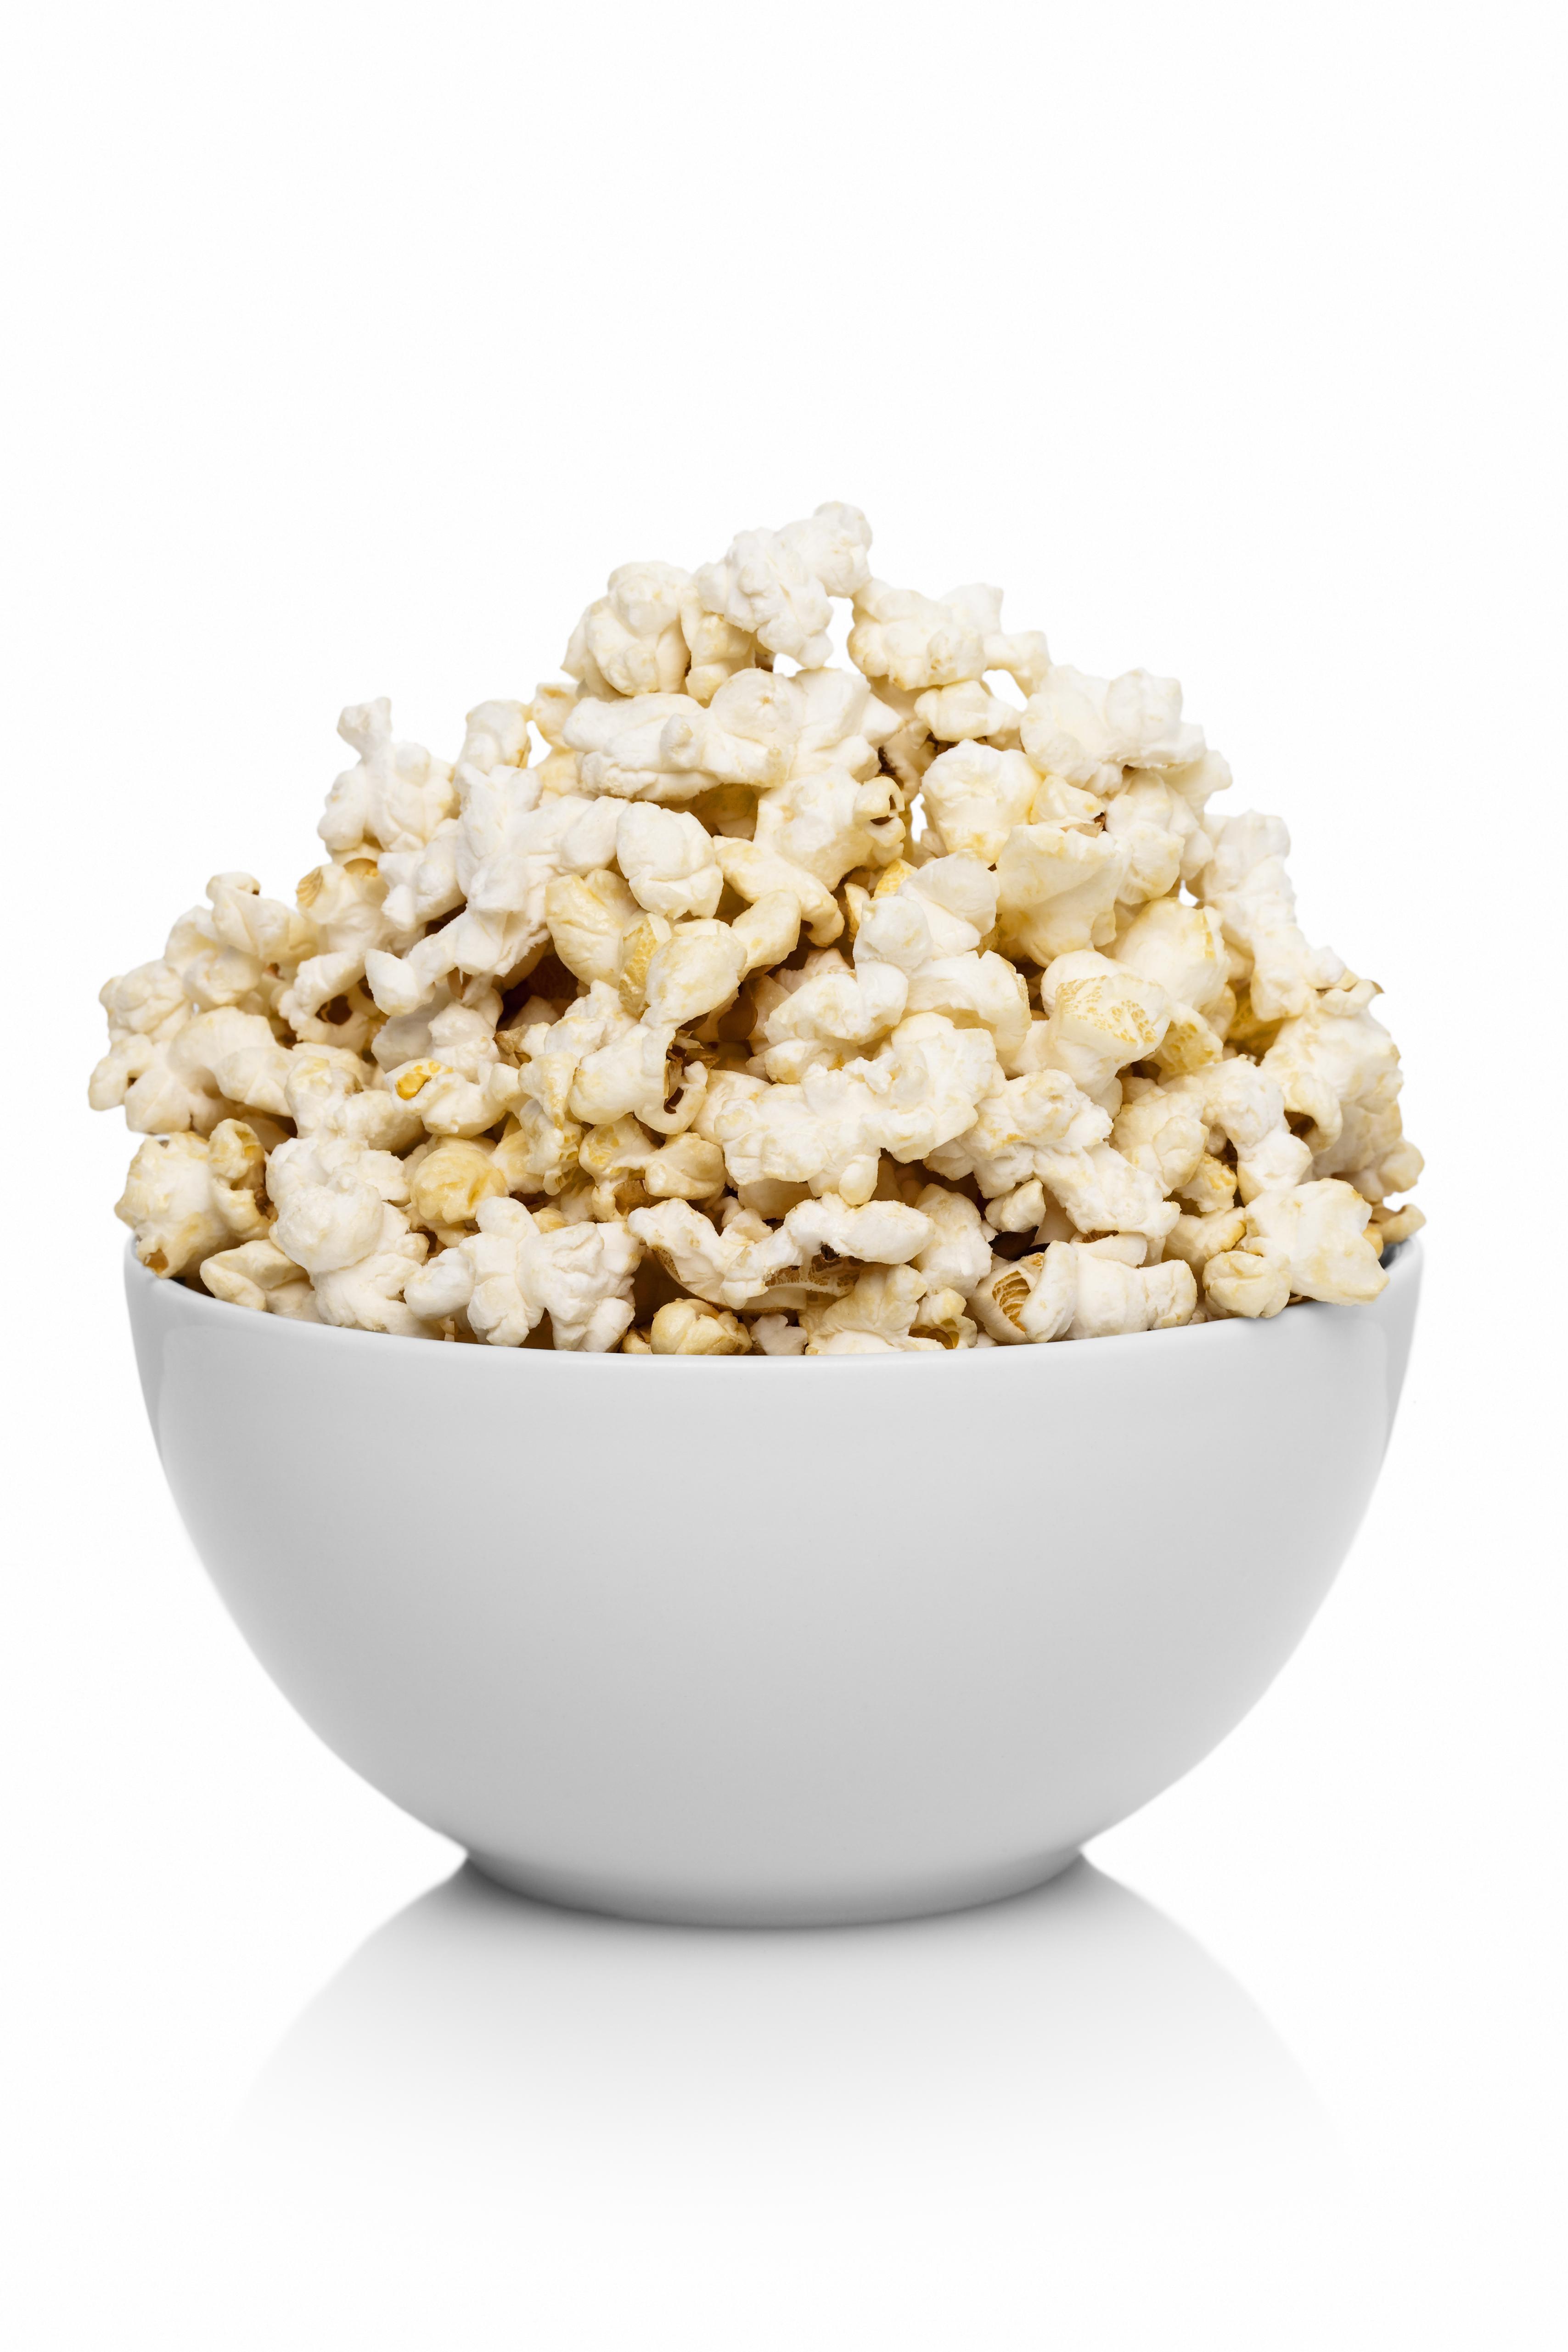 1. Popcorn bowls (via Getty Images)